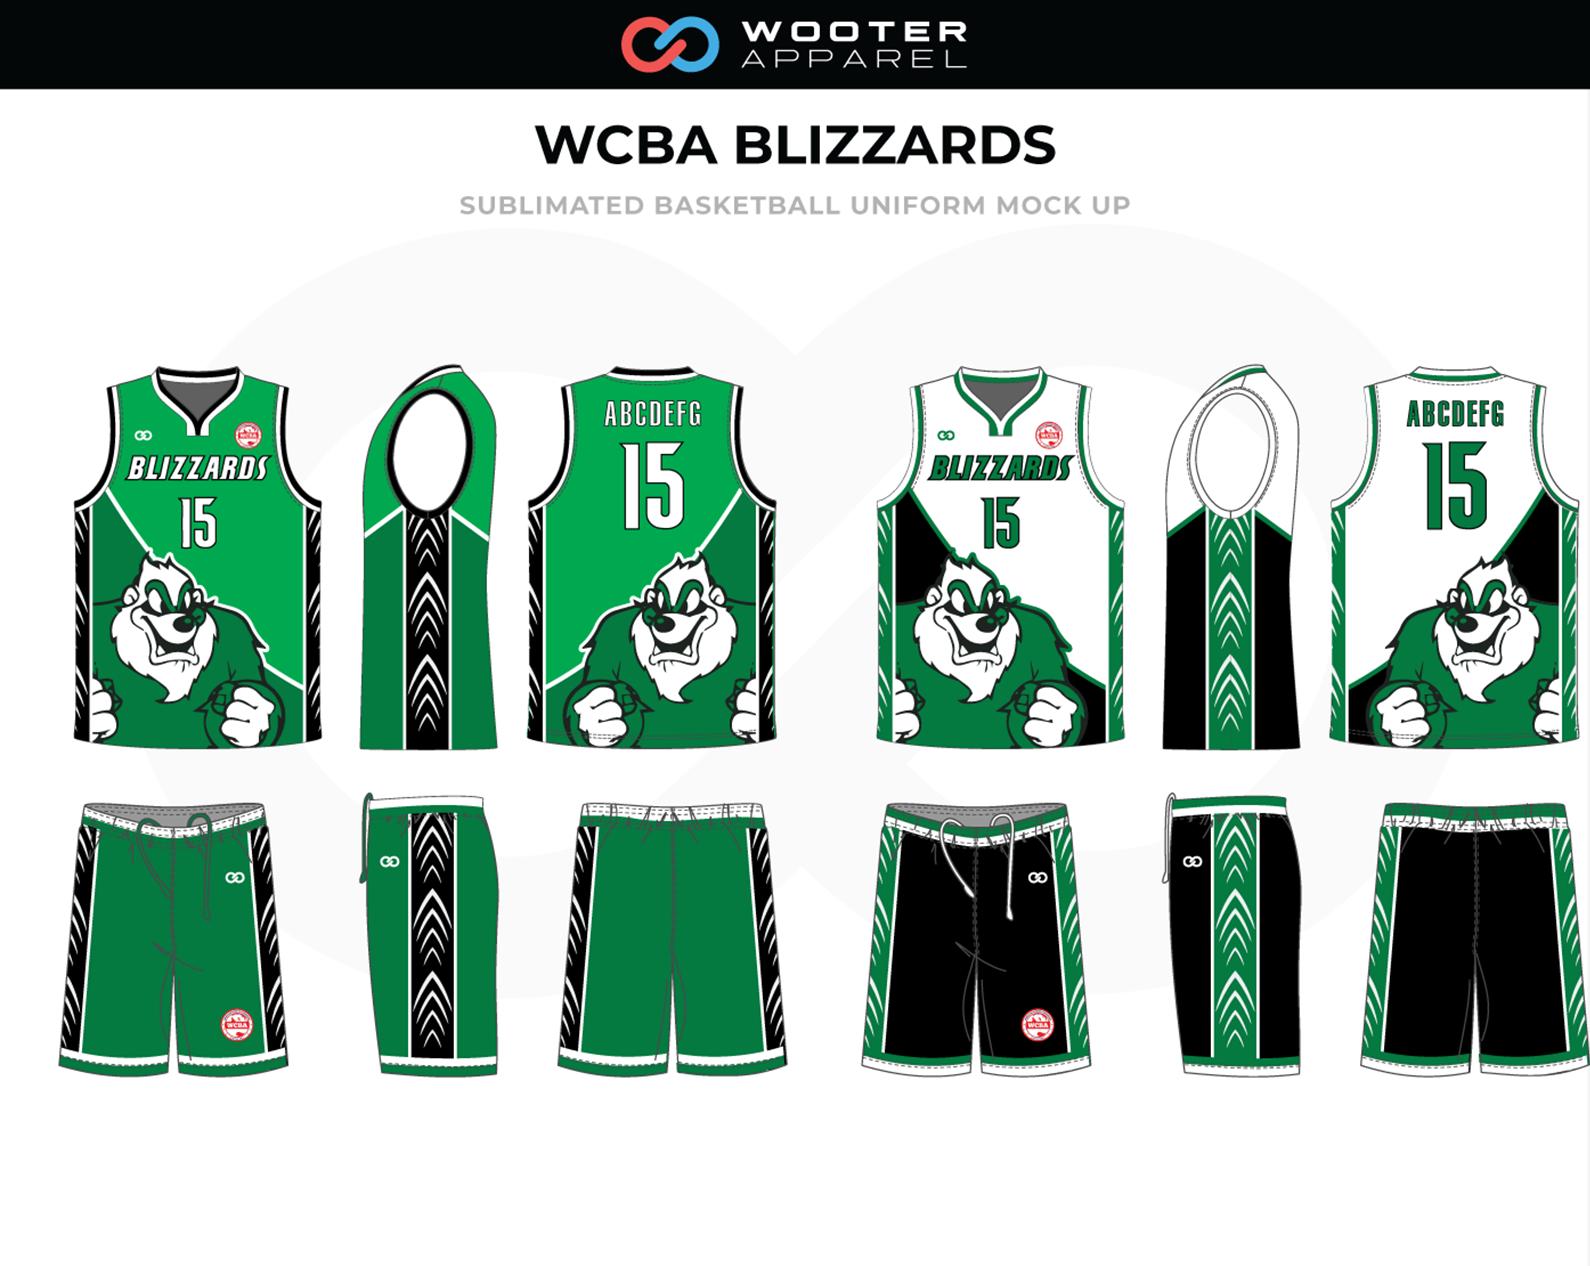 Custom Basketball Uniforms Basketball Jerseys Wooter Apparel